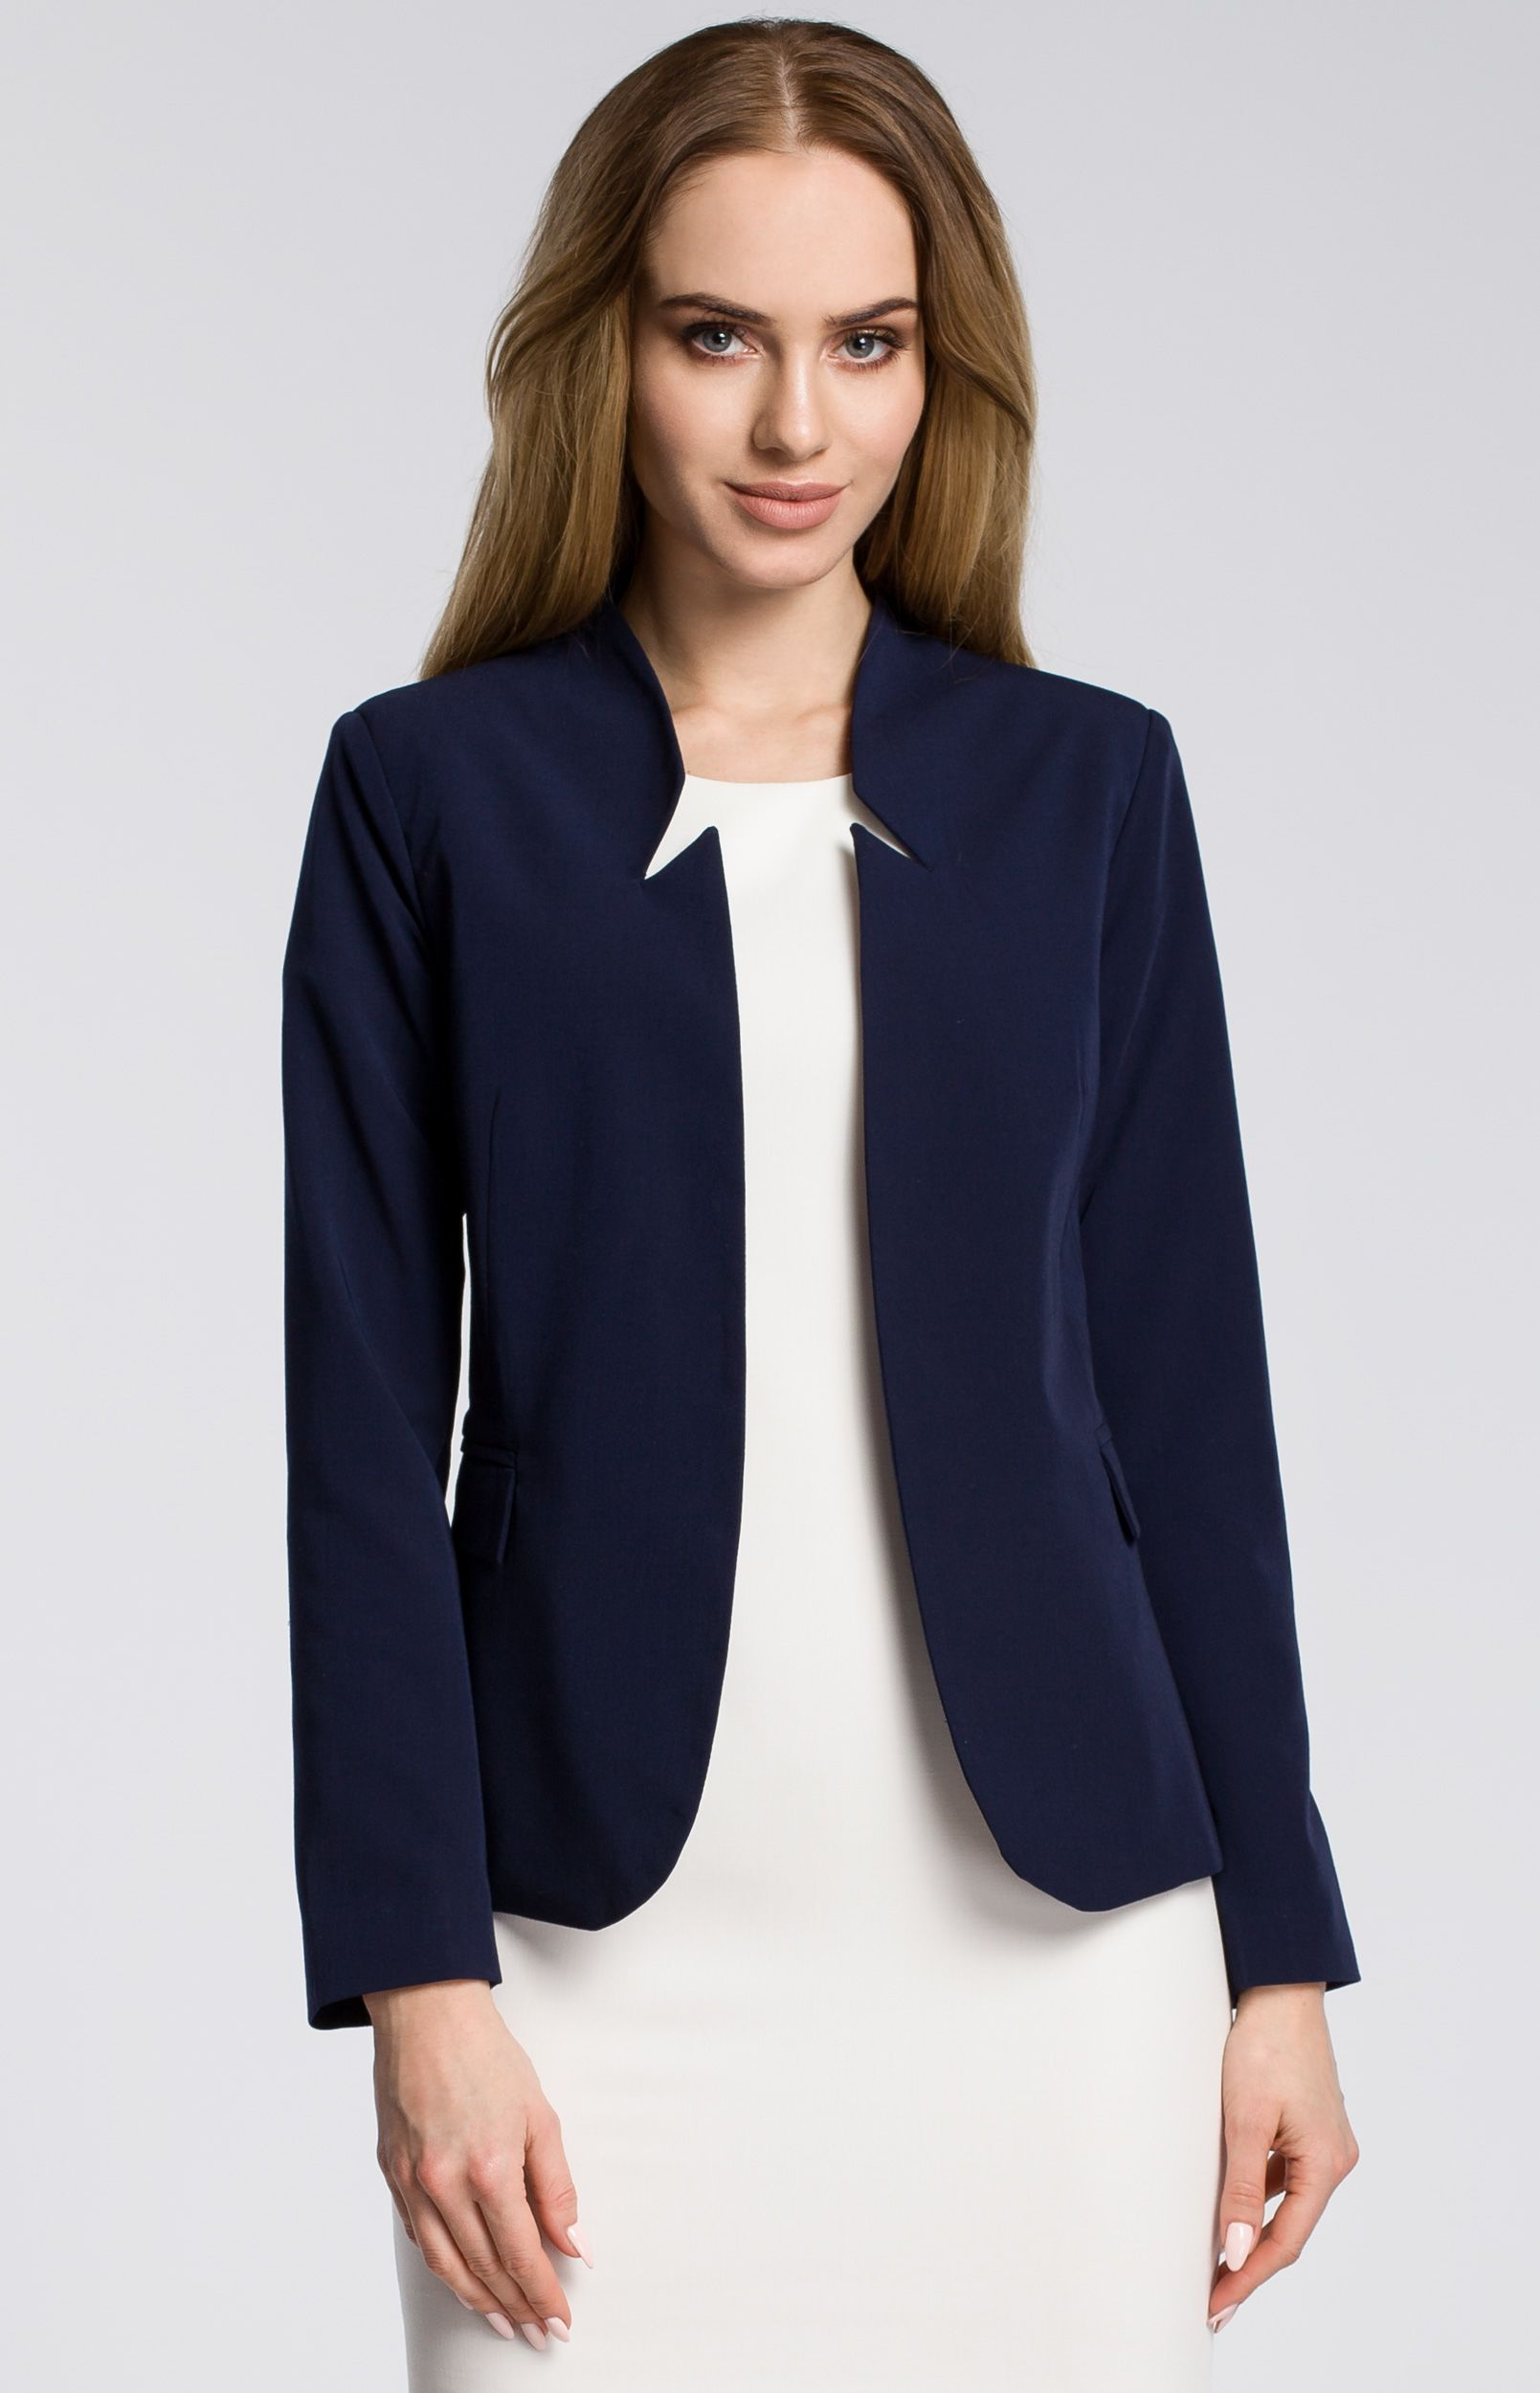 Veste femme blazer bleu marine